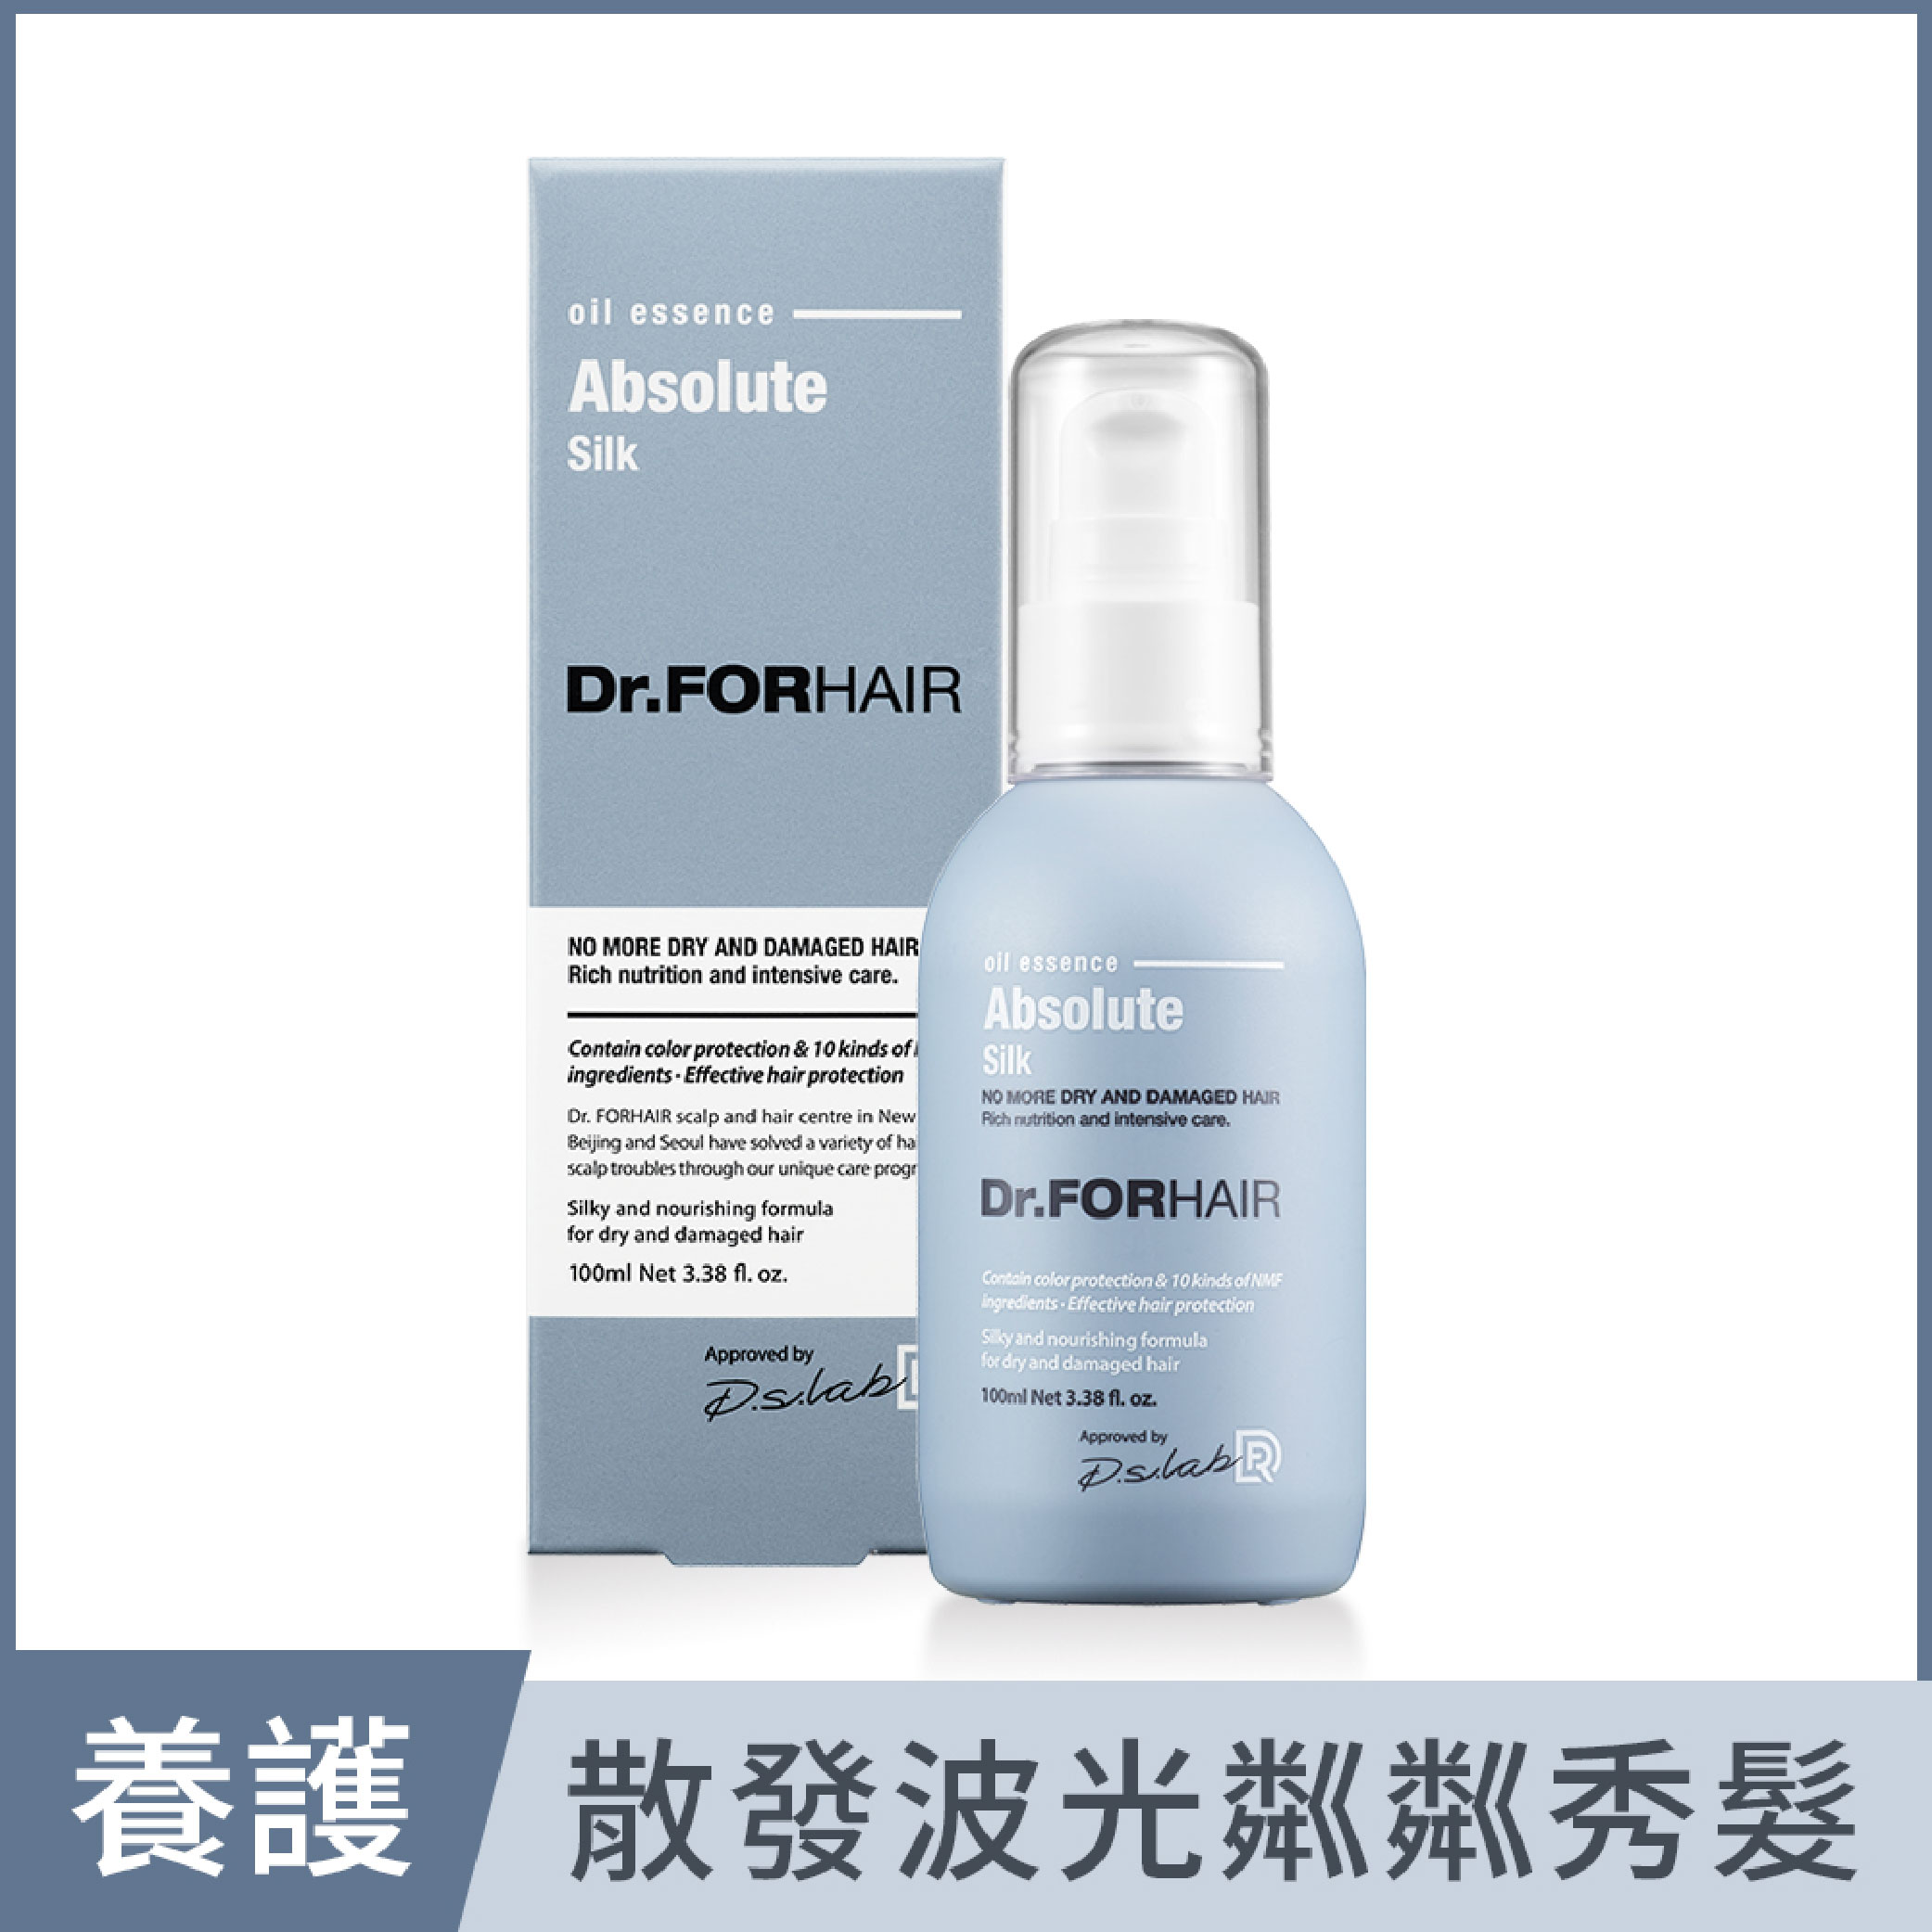 【Dr.FORHAIR】深層修護絲柔護髮油100ml